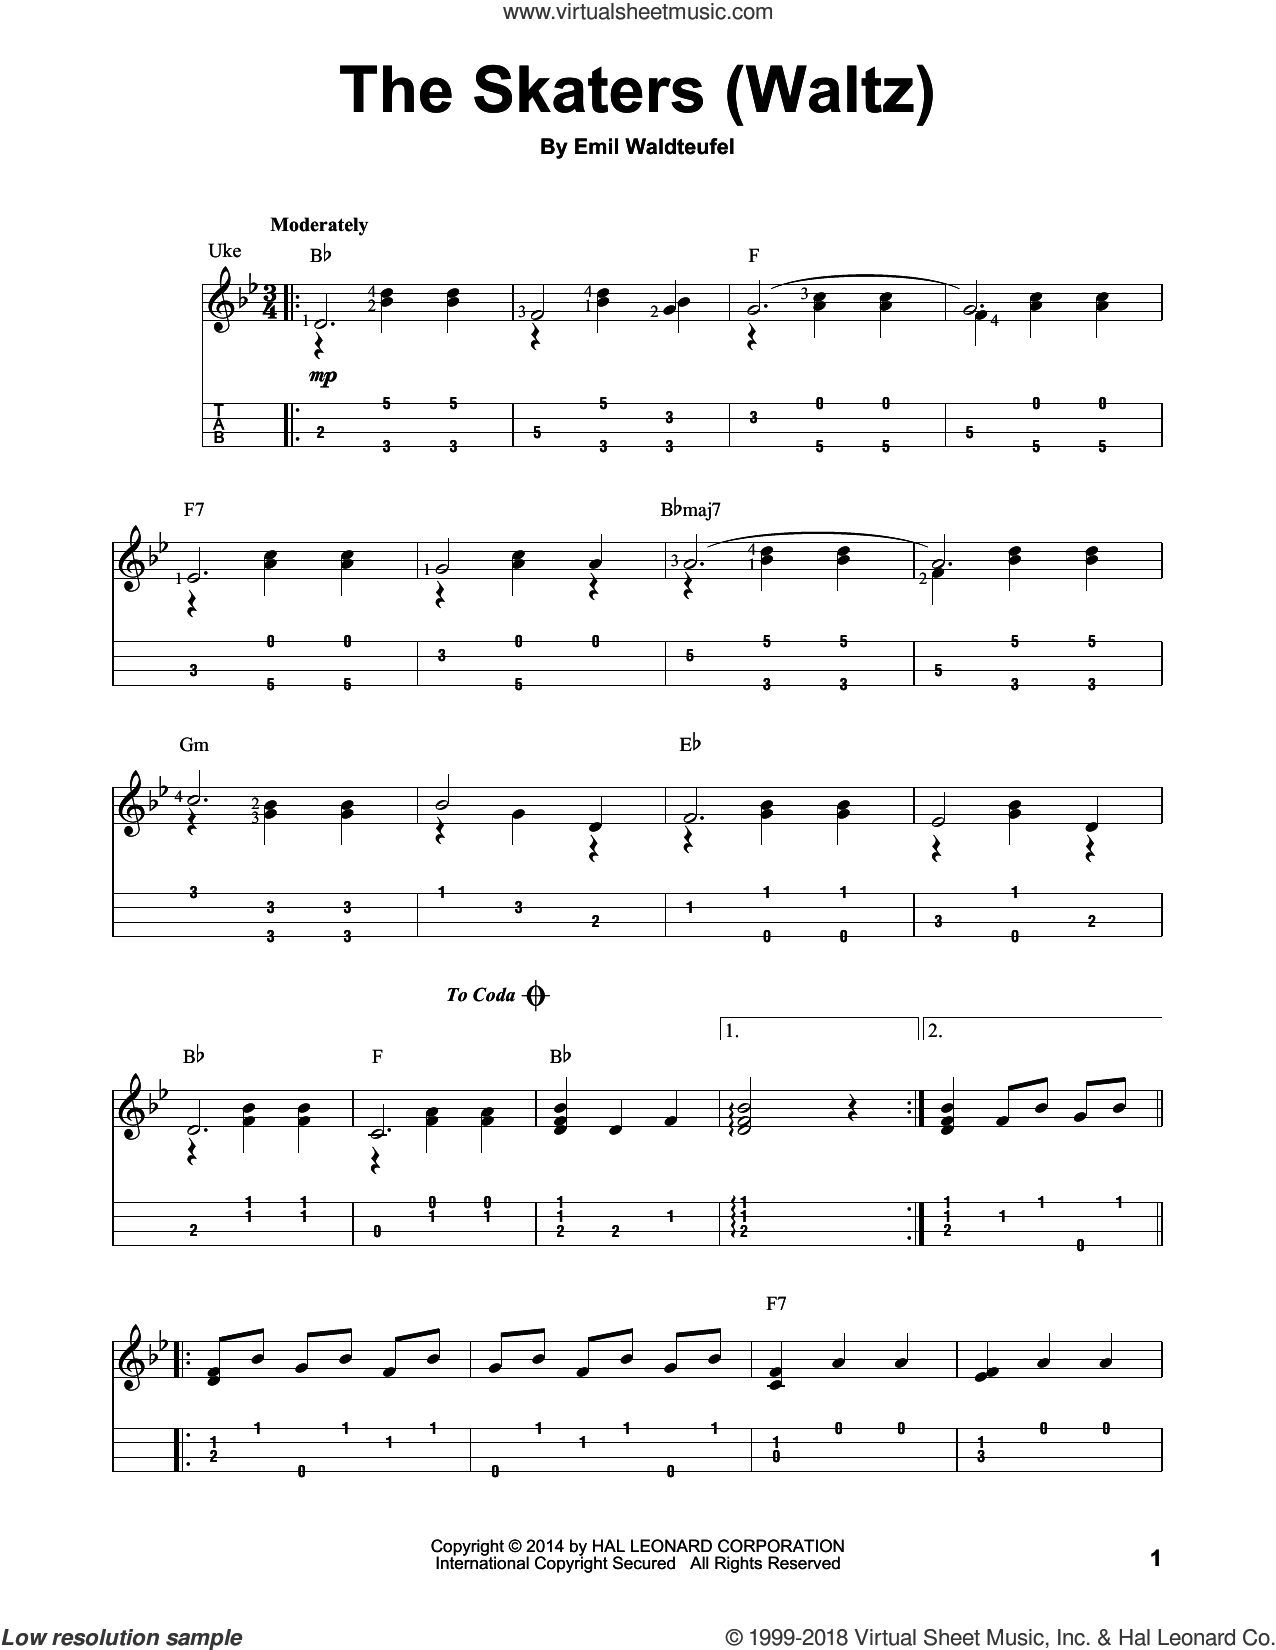 The Skaters (Waltz) sheet music for ukulele by Emile Waldteufel, classical score, intermediate skill level